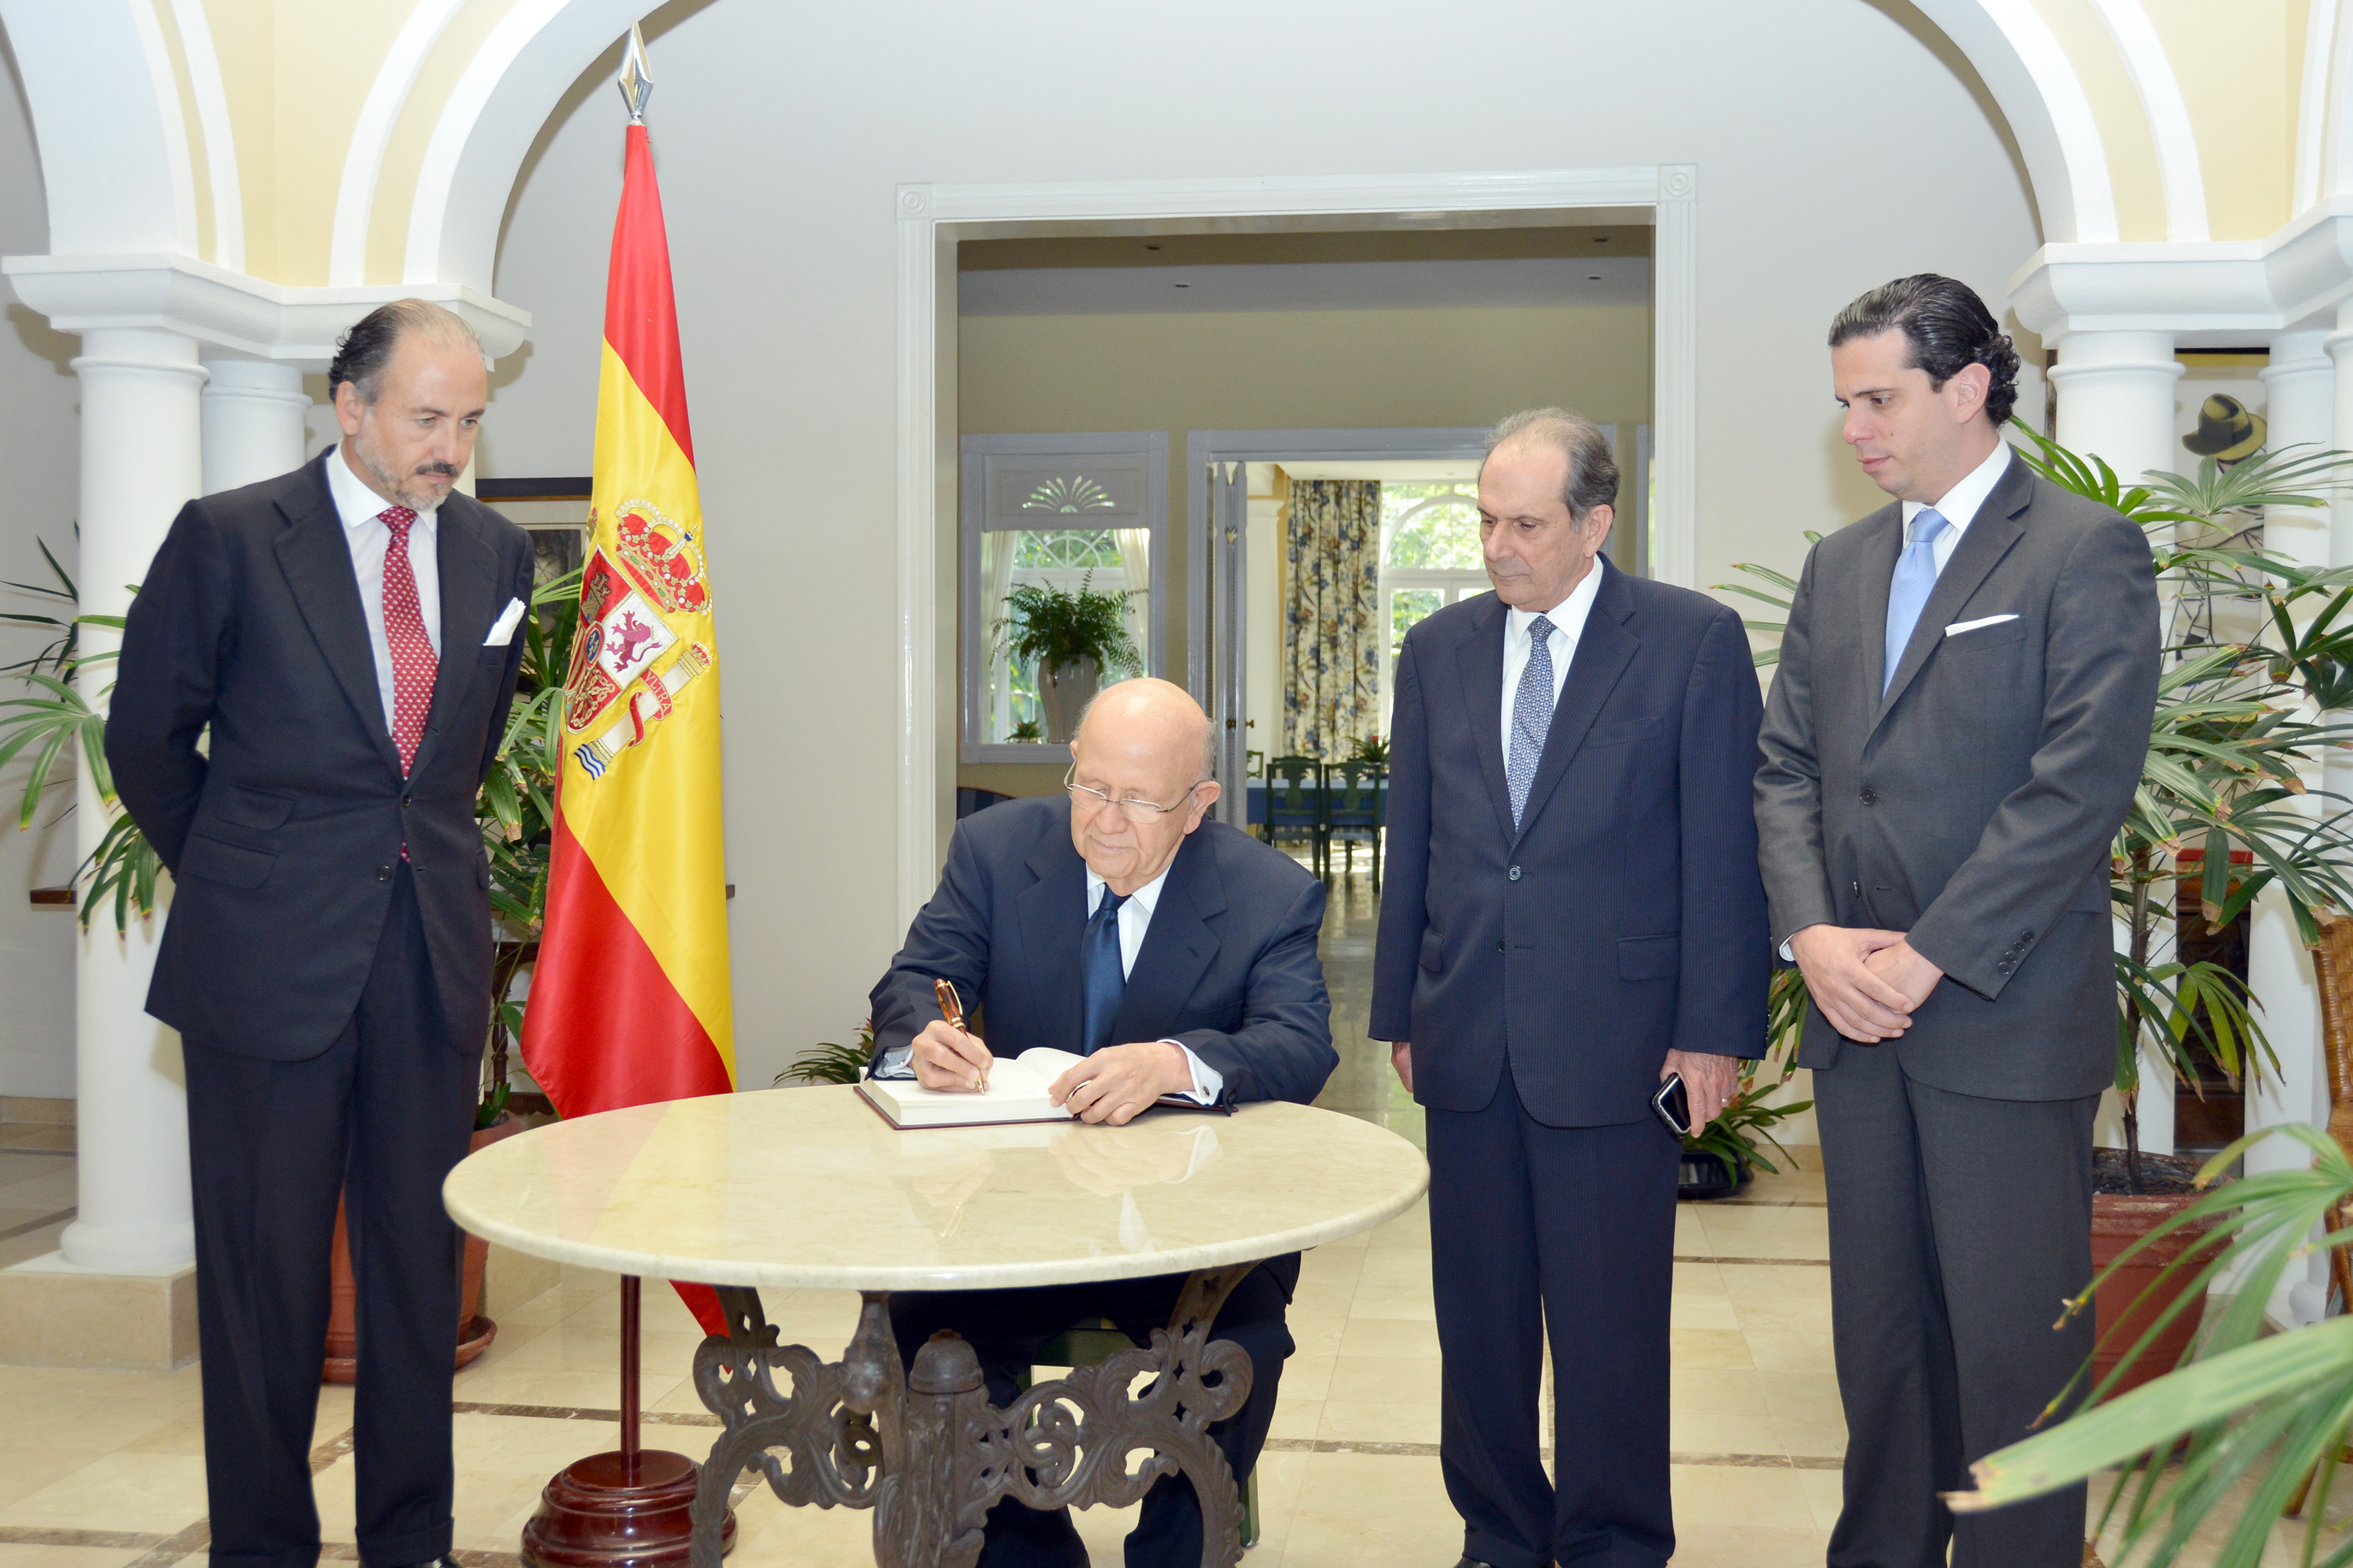 Canciller firma libro de condolencias por muerte de ex Presidente español